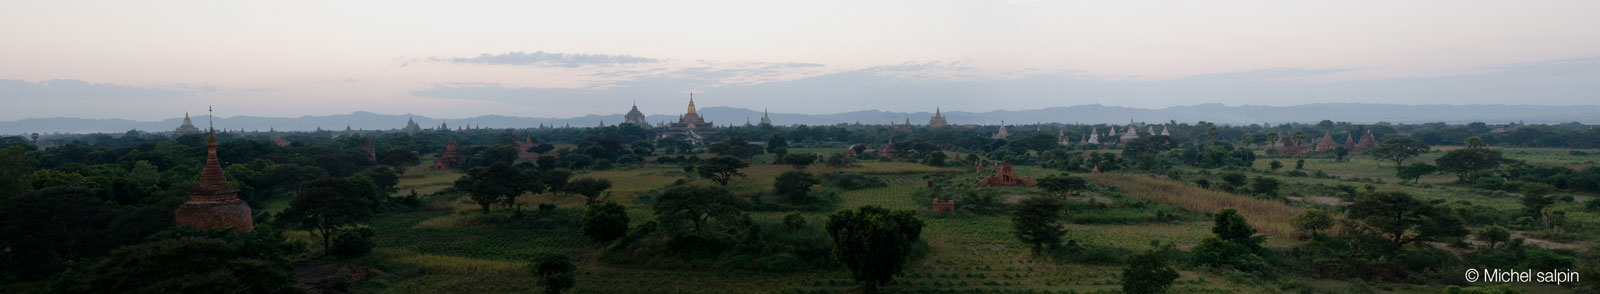 Bagan - Birmanie - Myanmar